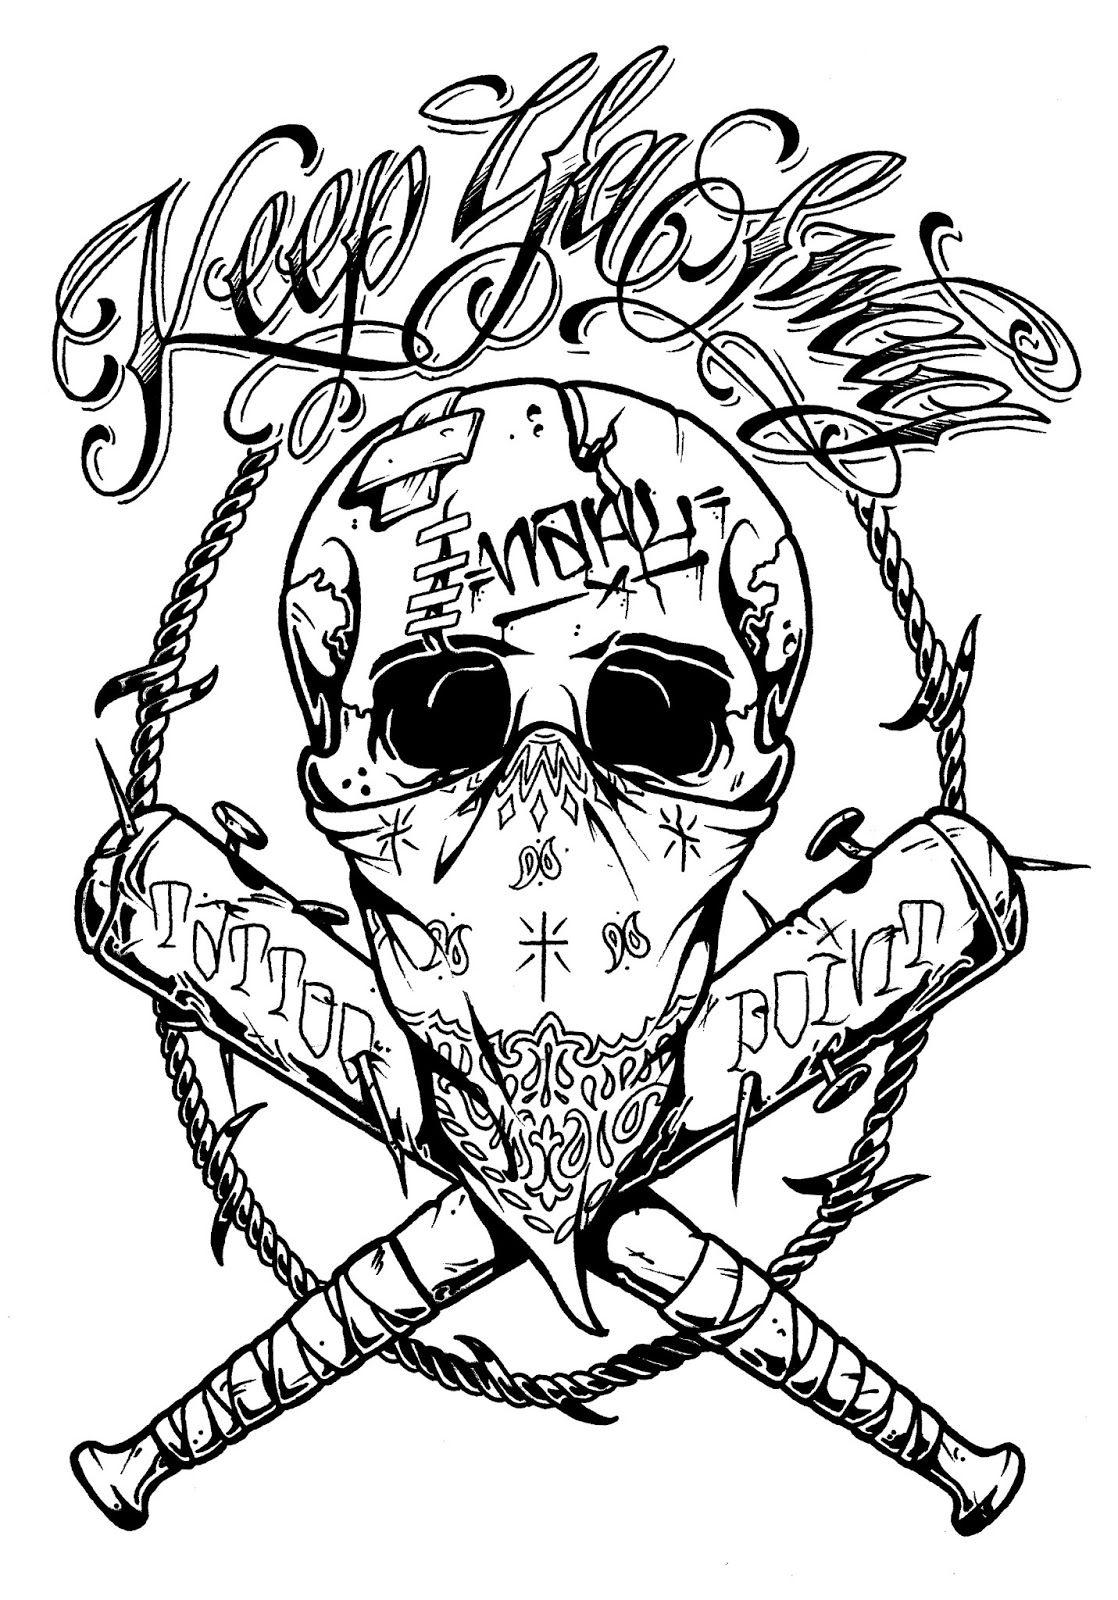 Crazy Skull Art martedì 15 gennaio 2013 Skulls and